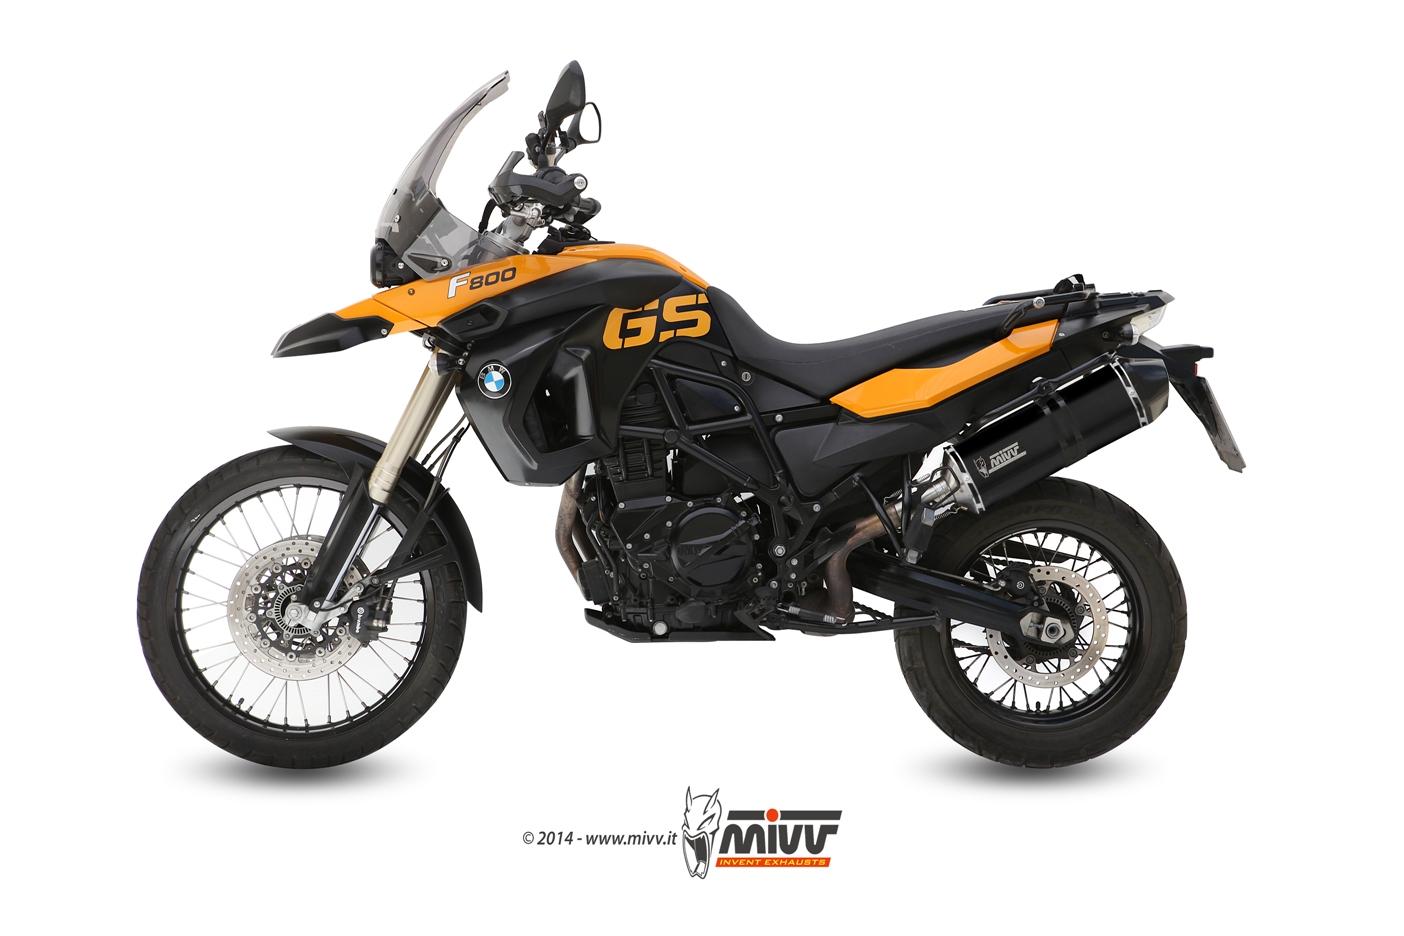 Silencieux homologué MIVV Speed Edge inox noir F650GS / F800GS (08-17)